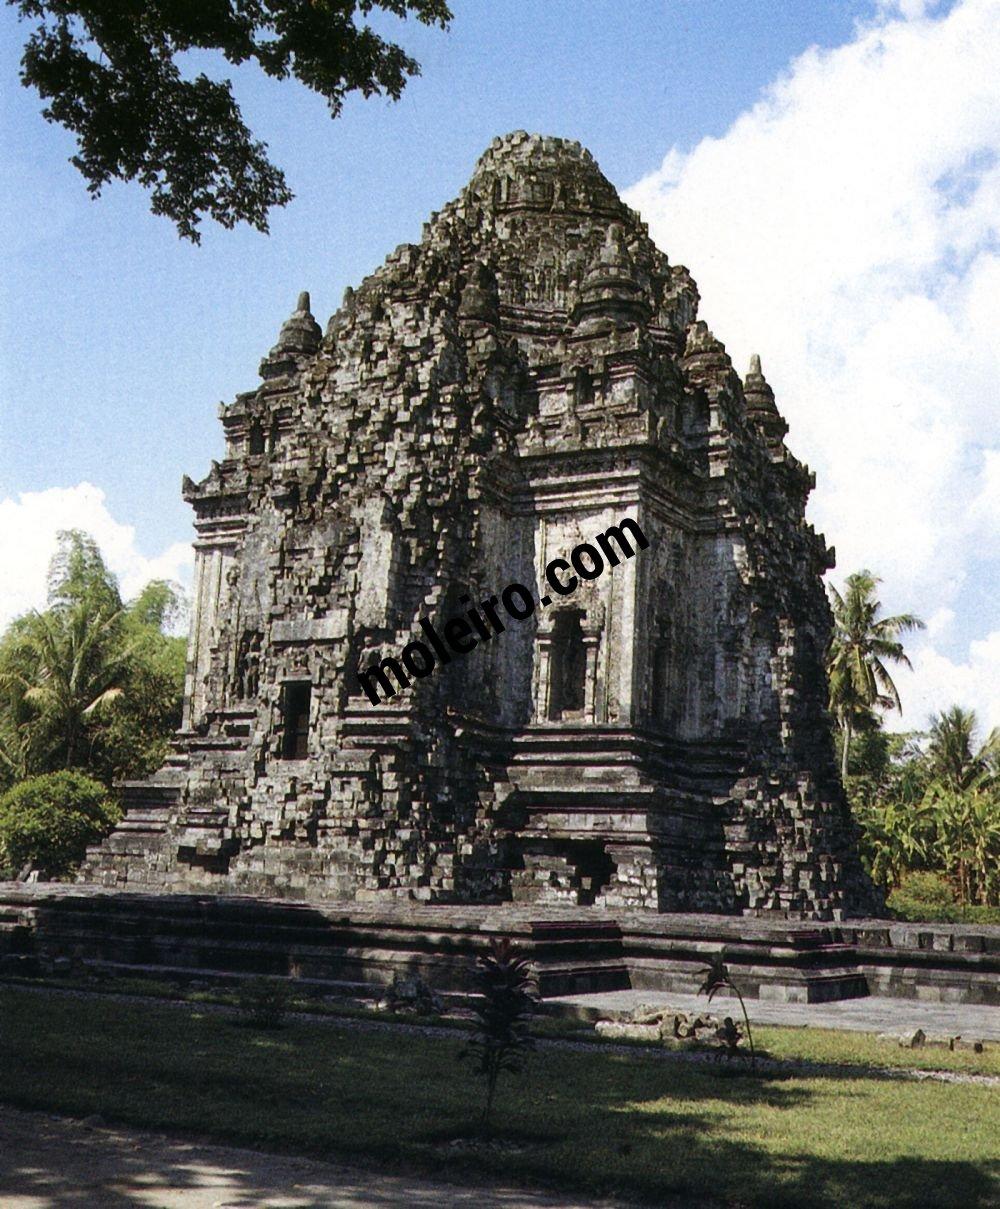 Borobudur ChandiKalasan, at Prambanan. Great Buddhist shrine. VIII-IX centuries.